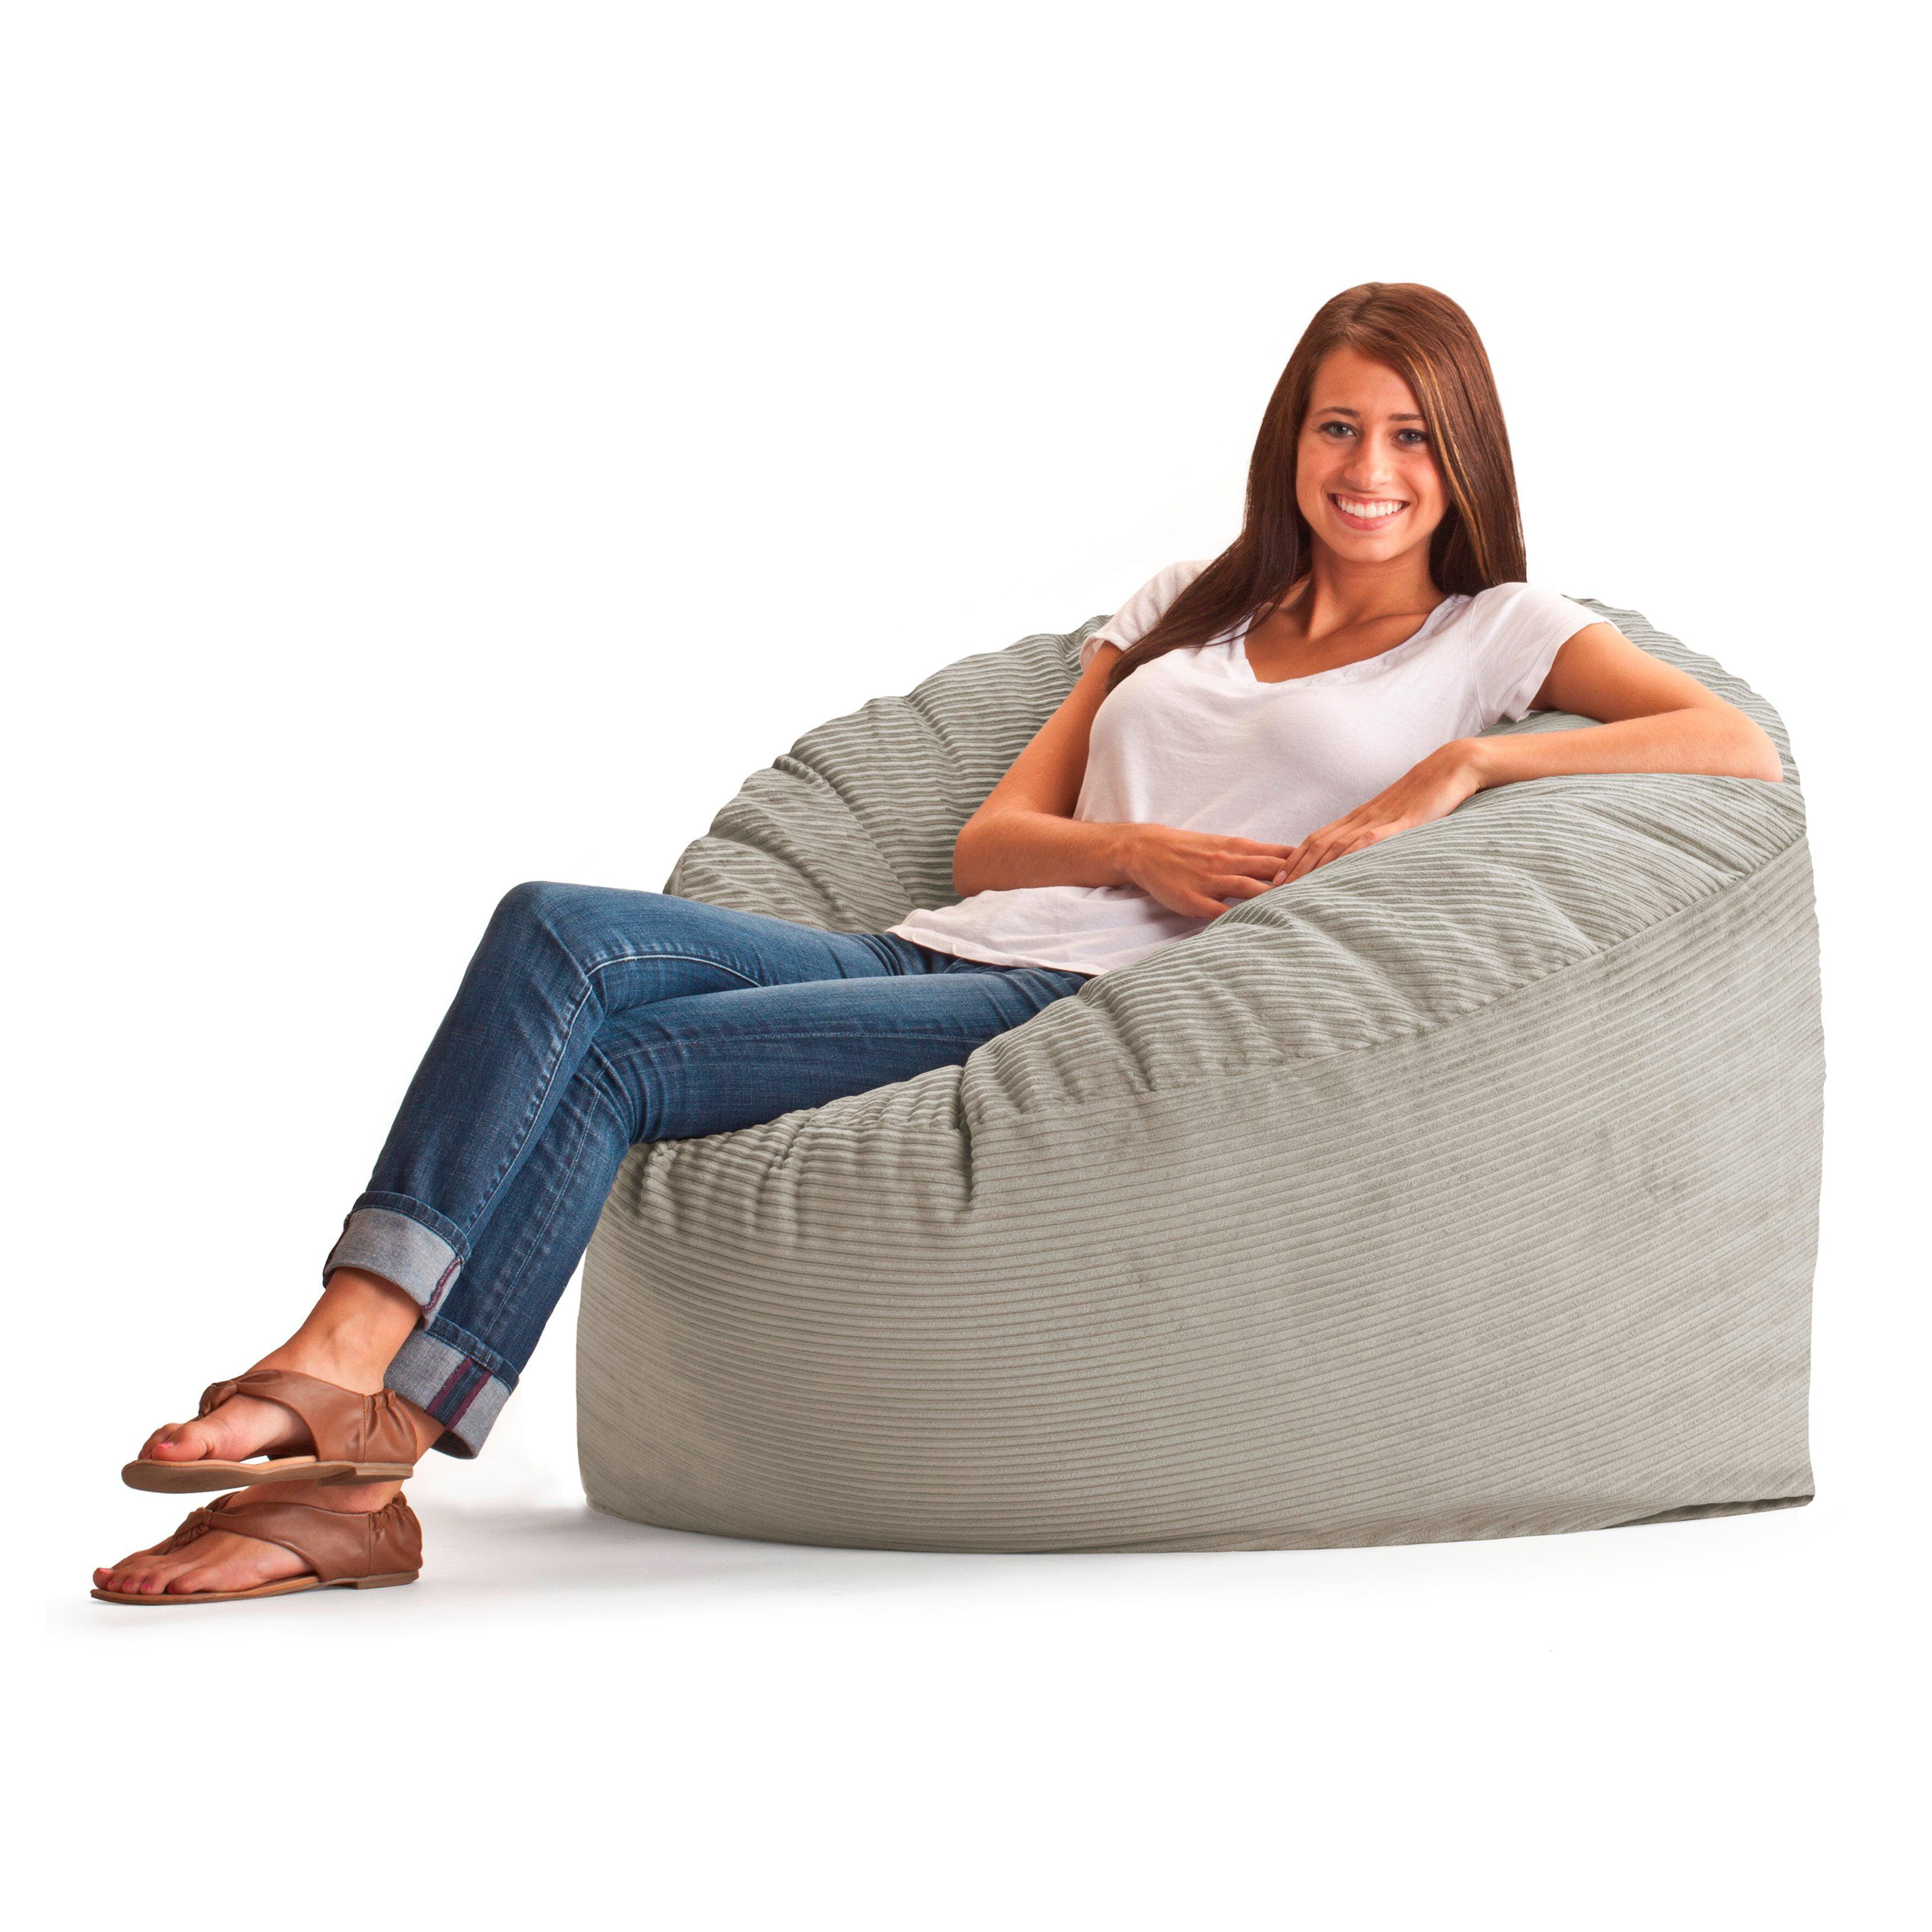 Original FUF Chair 3 Ft. Wide Wale Corduroy Bean Bag Lounger   Beach    Walmart.com